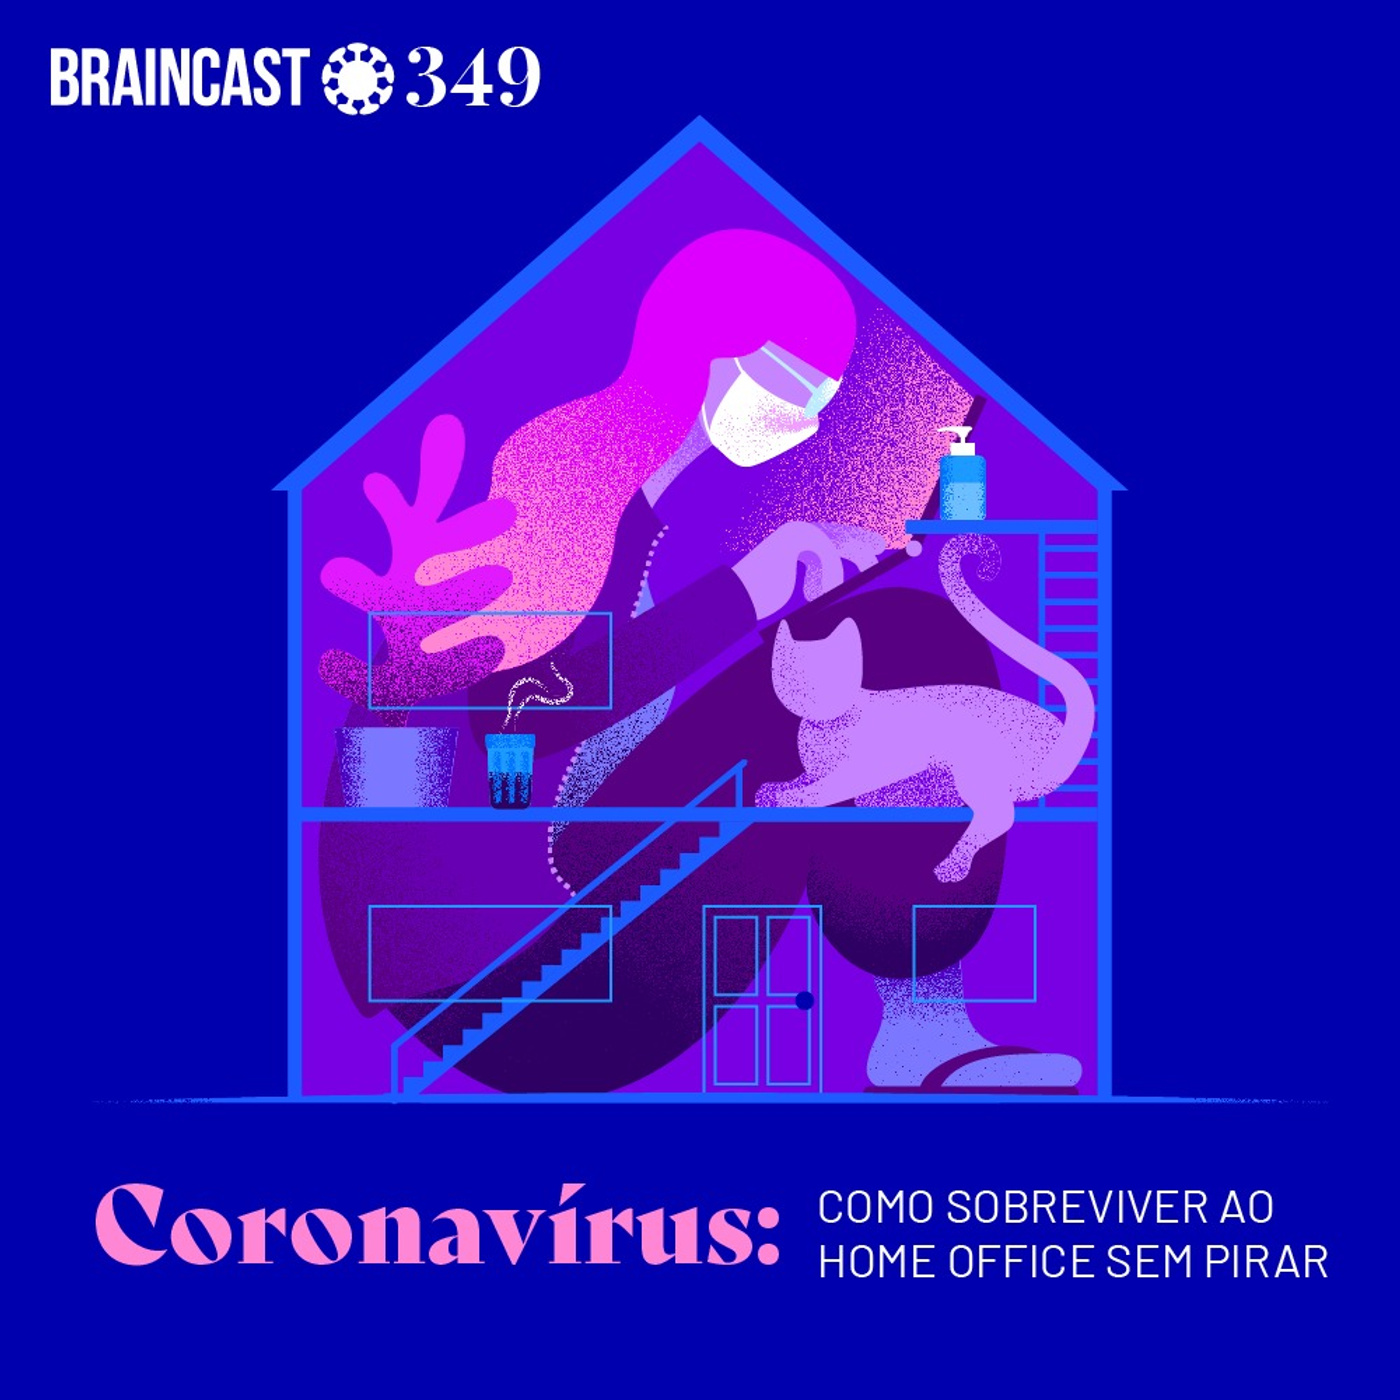 Coronavírus: como sobreviver ao home office sem pirar